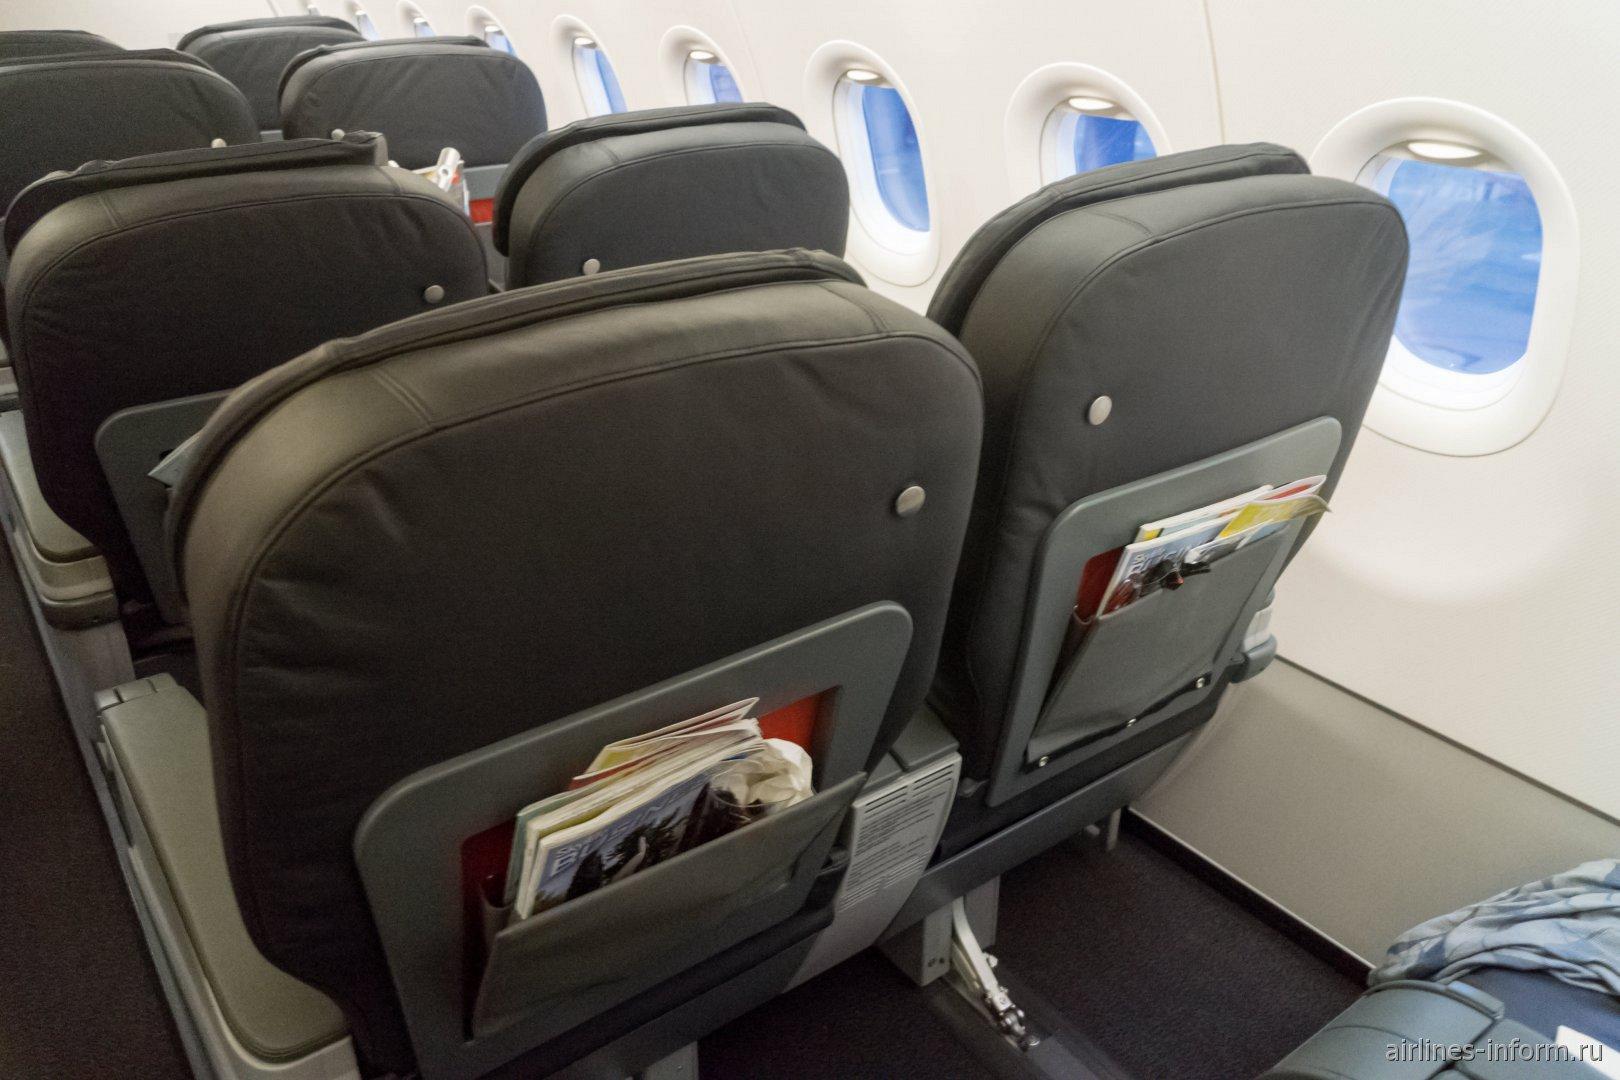 Пассажирские кресла бизнес-класса в Airbus A321 Turkish Airlines